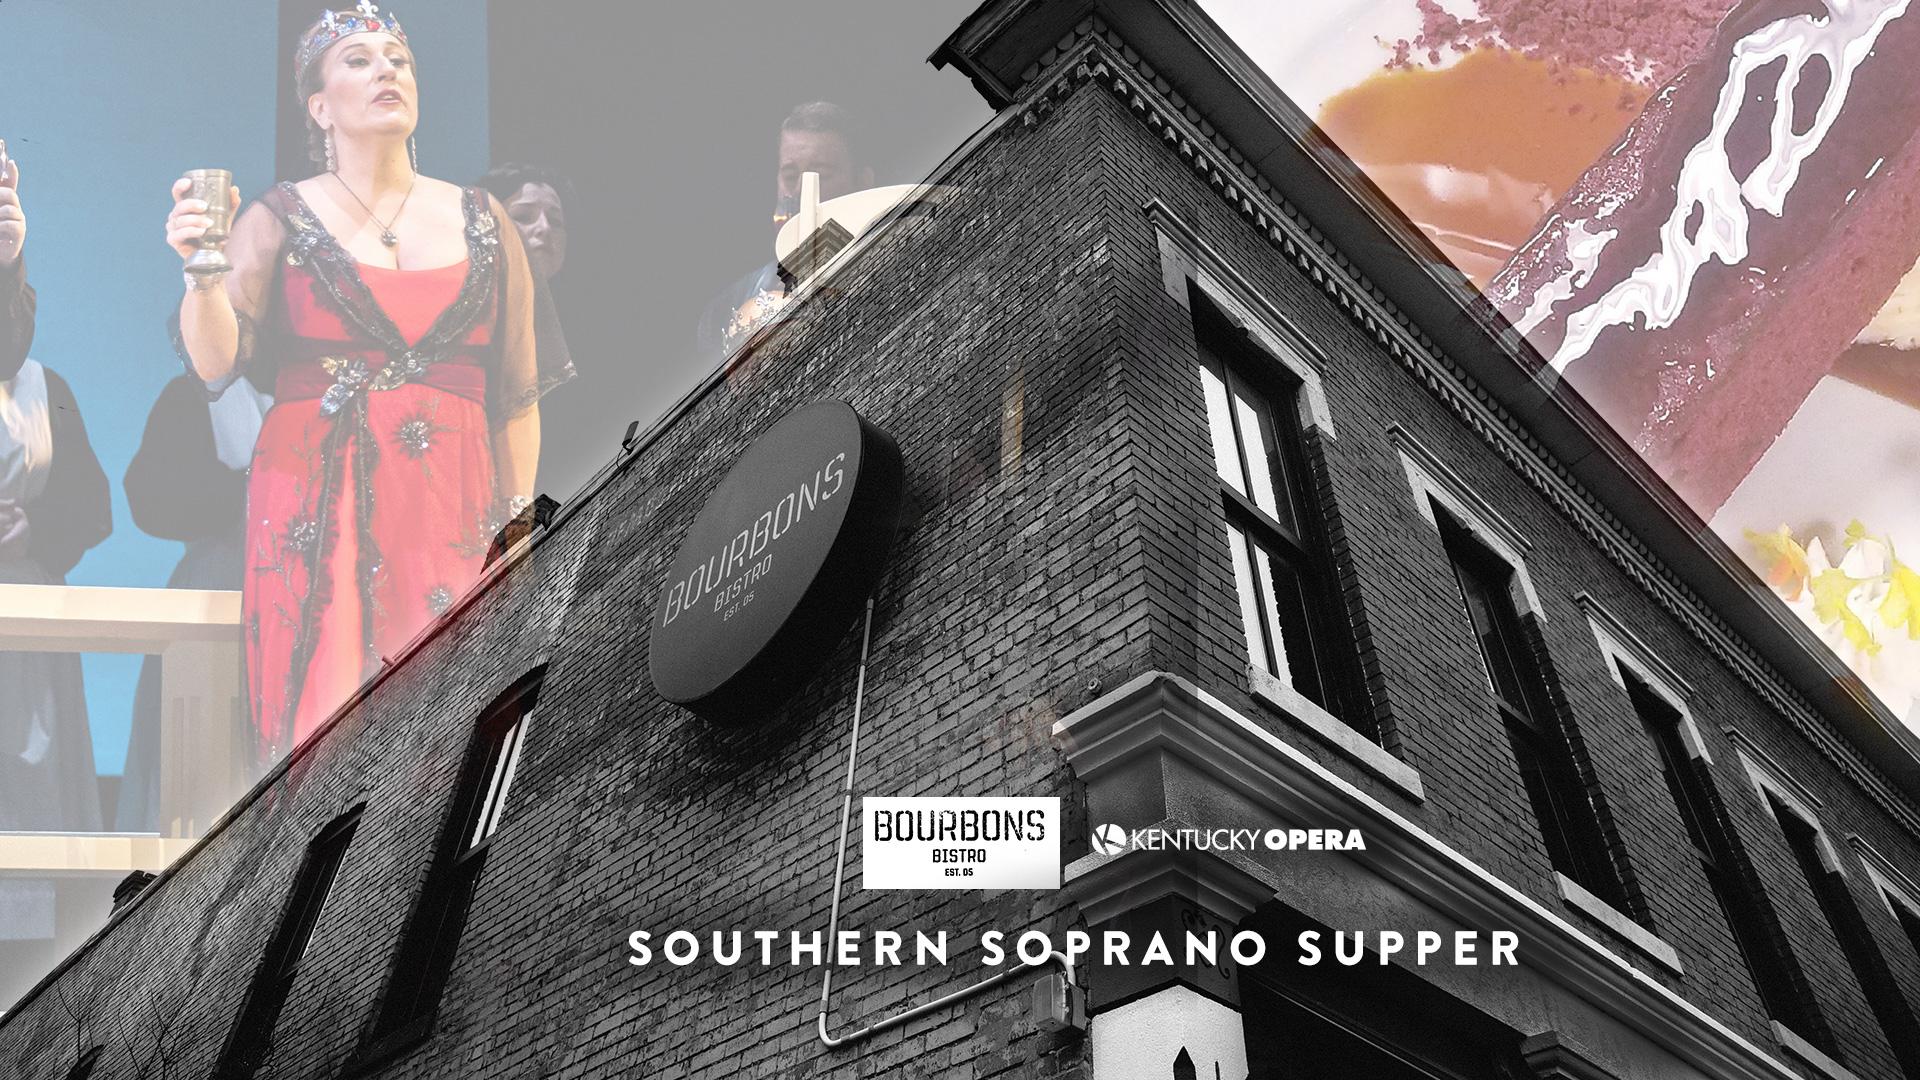 soprano-supper-facebook-cover.jpg